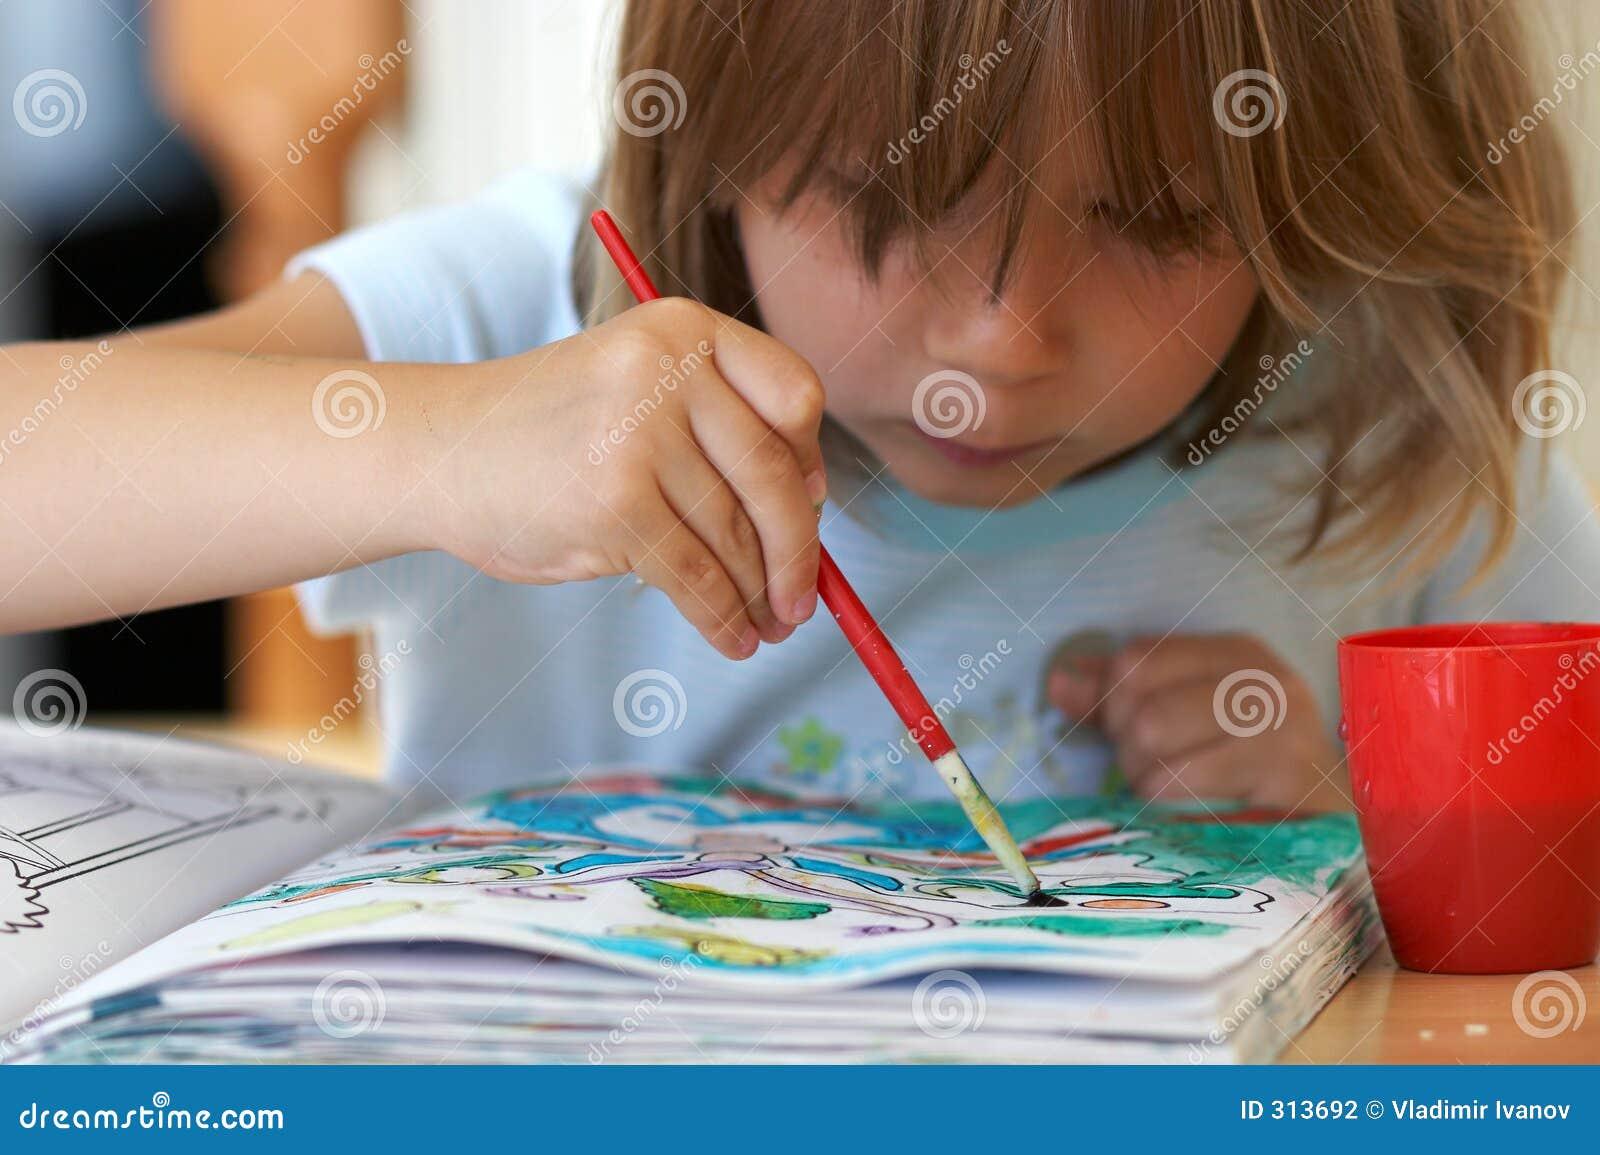 Mooi meisje dat een boek kleurt